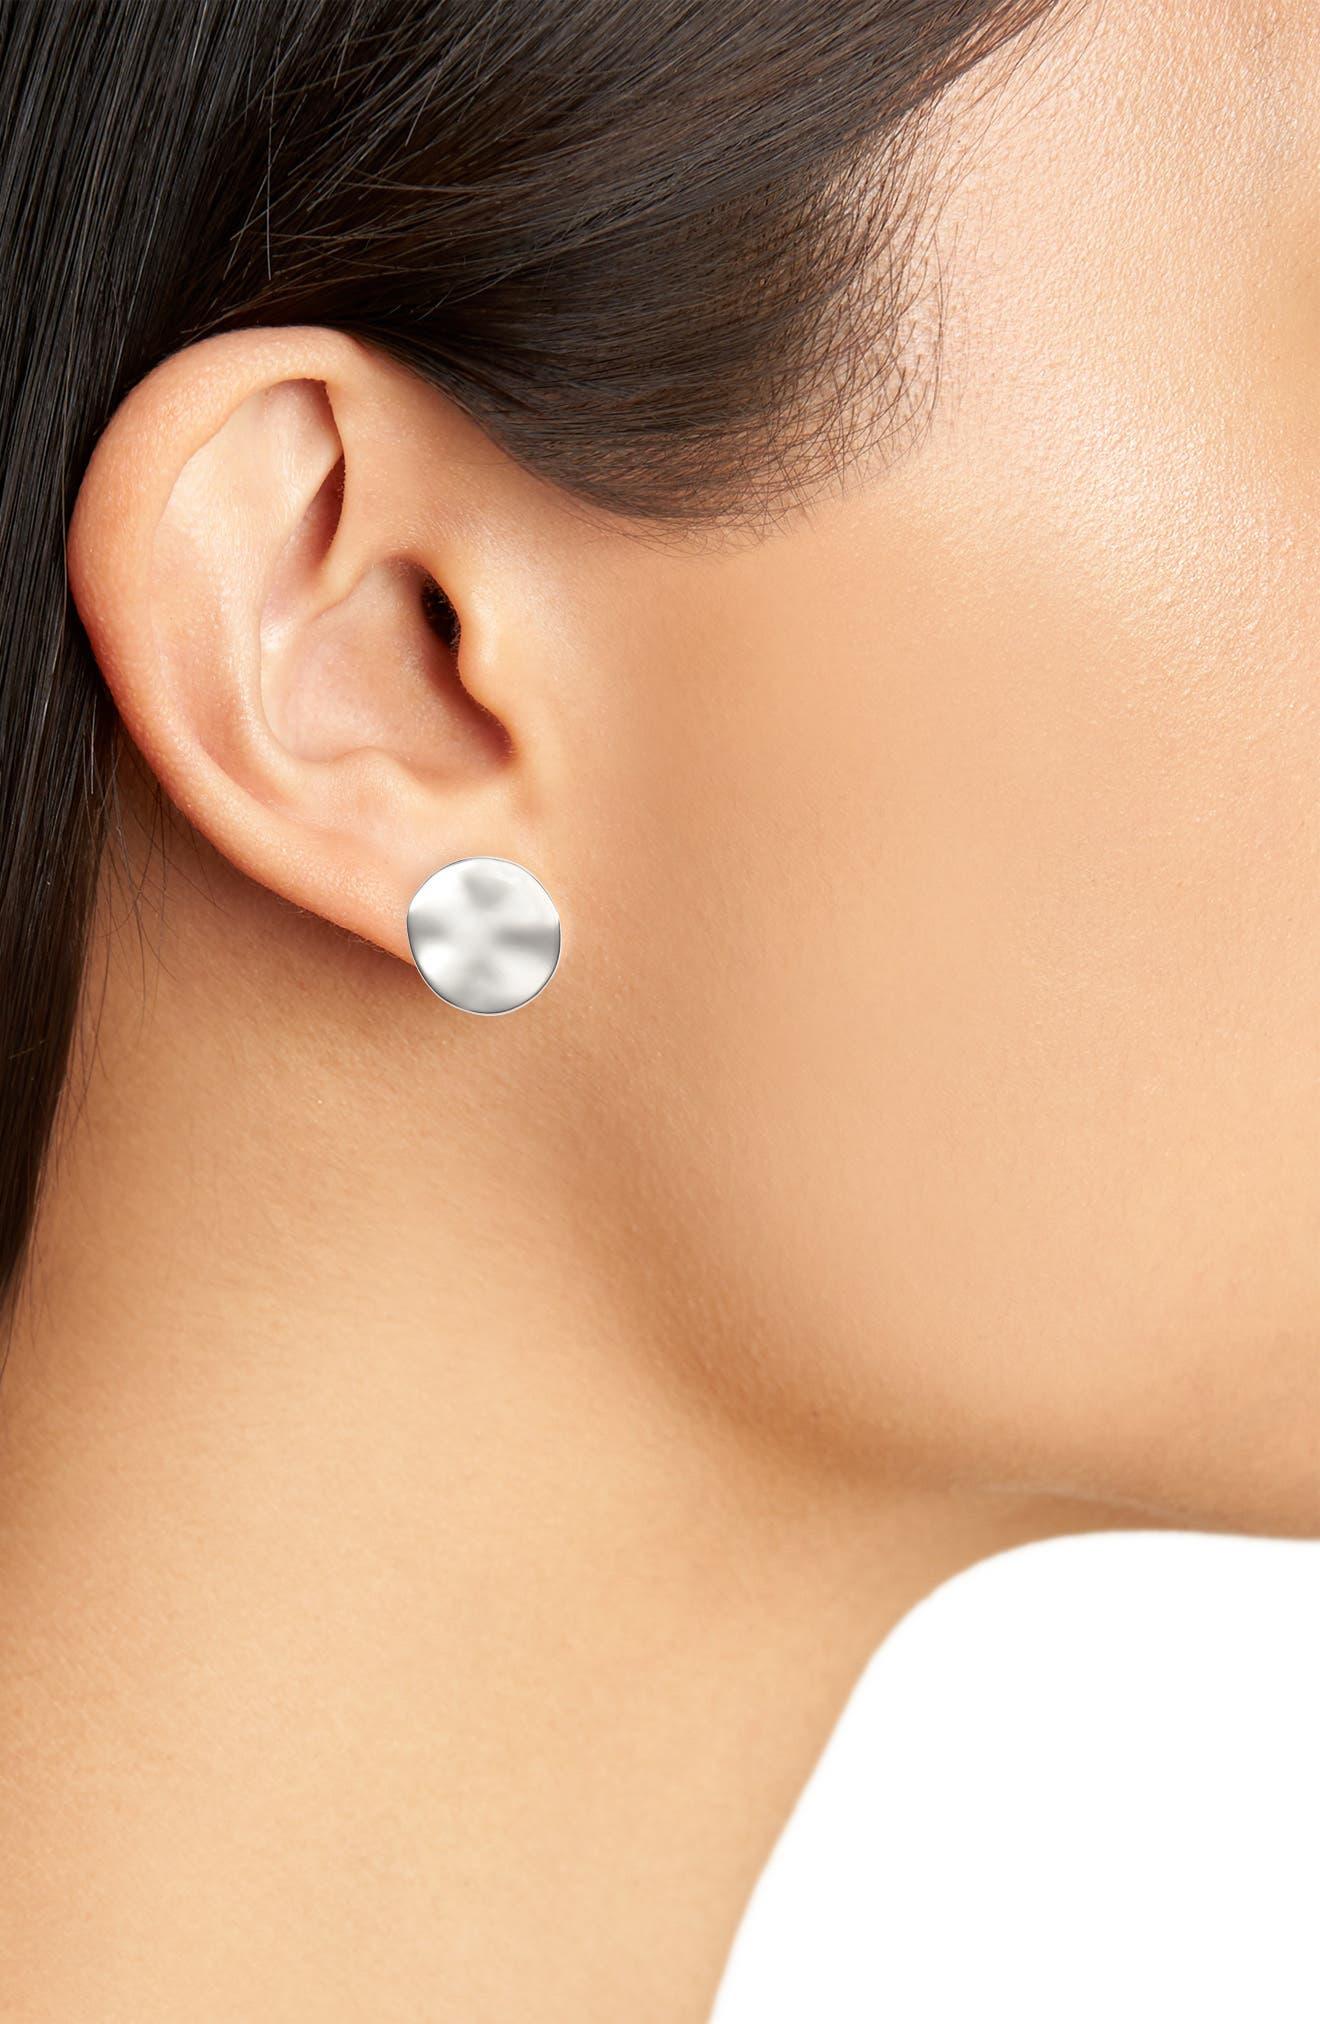 GORJANA, Chloe Large Stud Earrings, Alternate thumbnail 2, color, SILVER